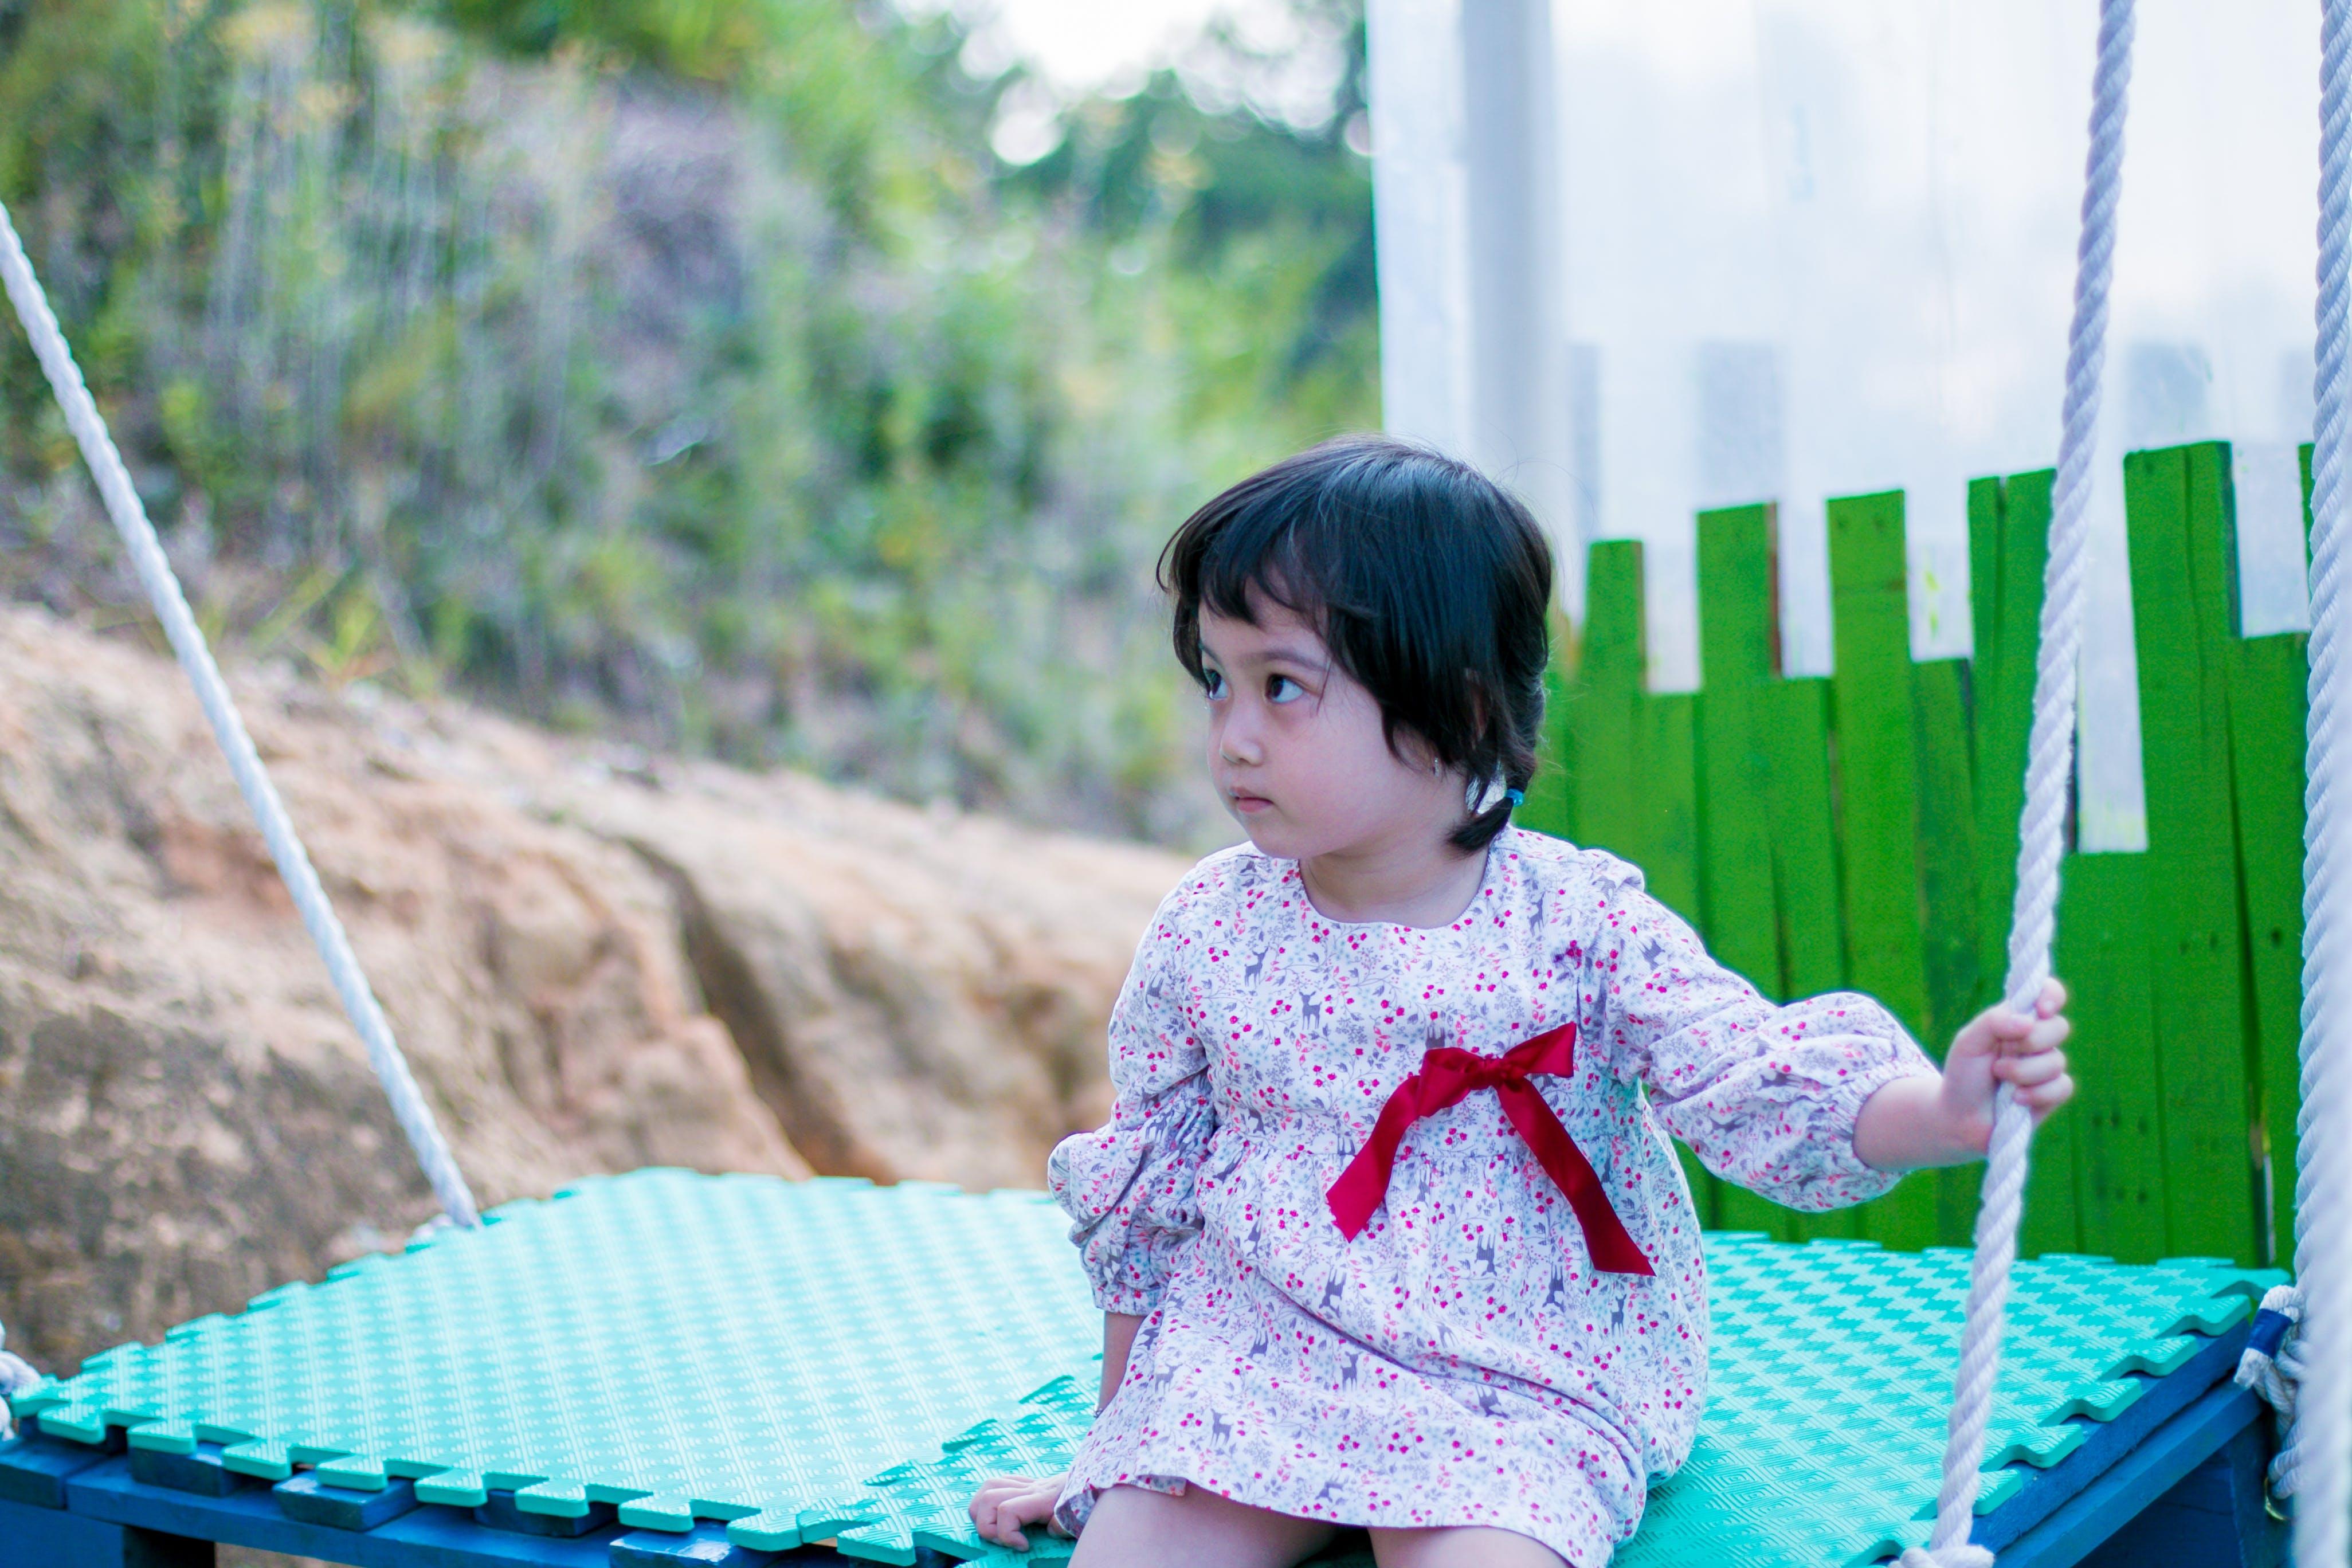 Girl Wearing White Long-sleeved Dress While Sitting on Swing